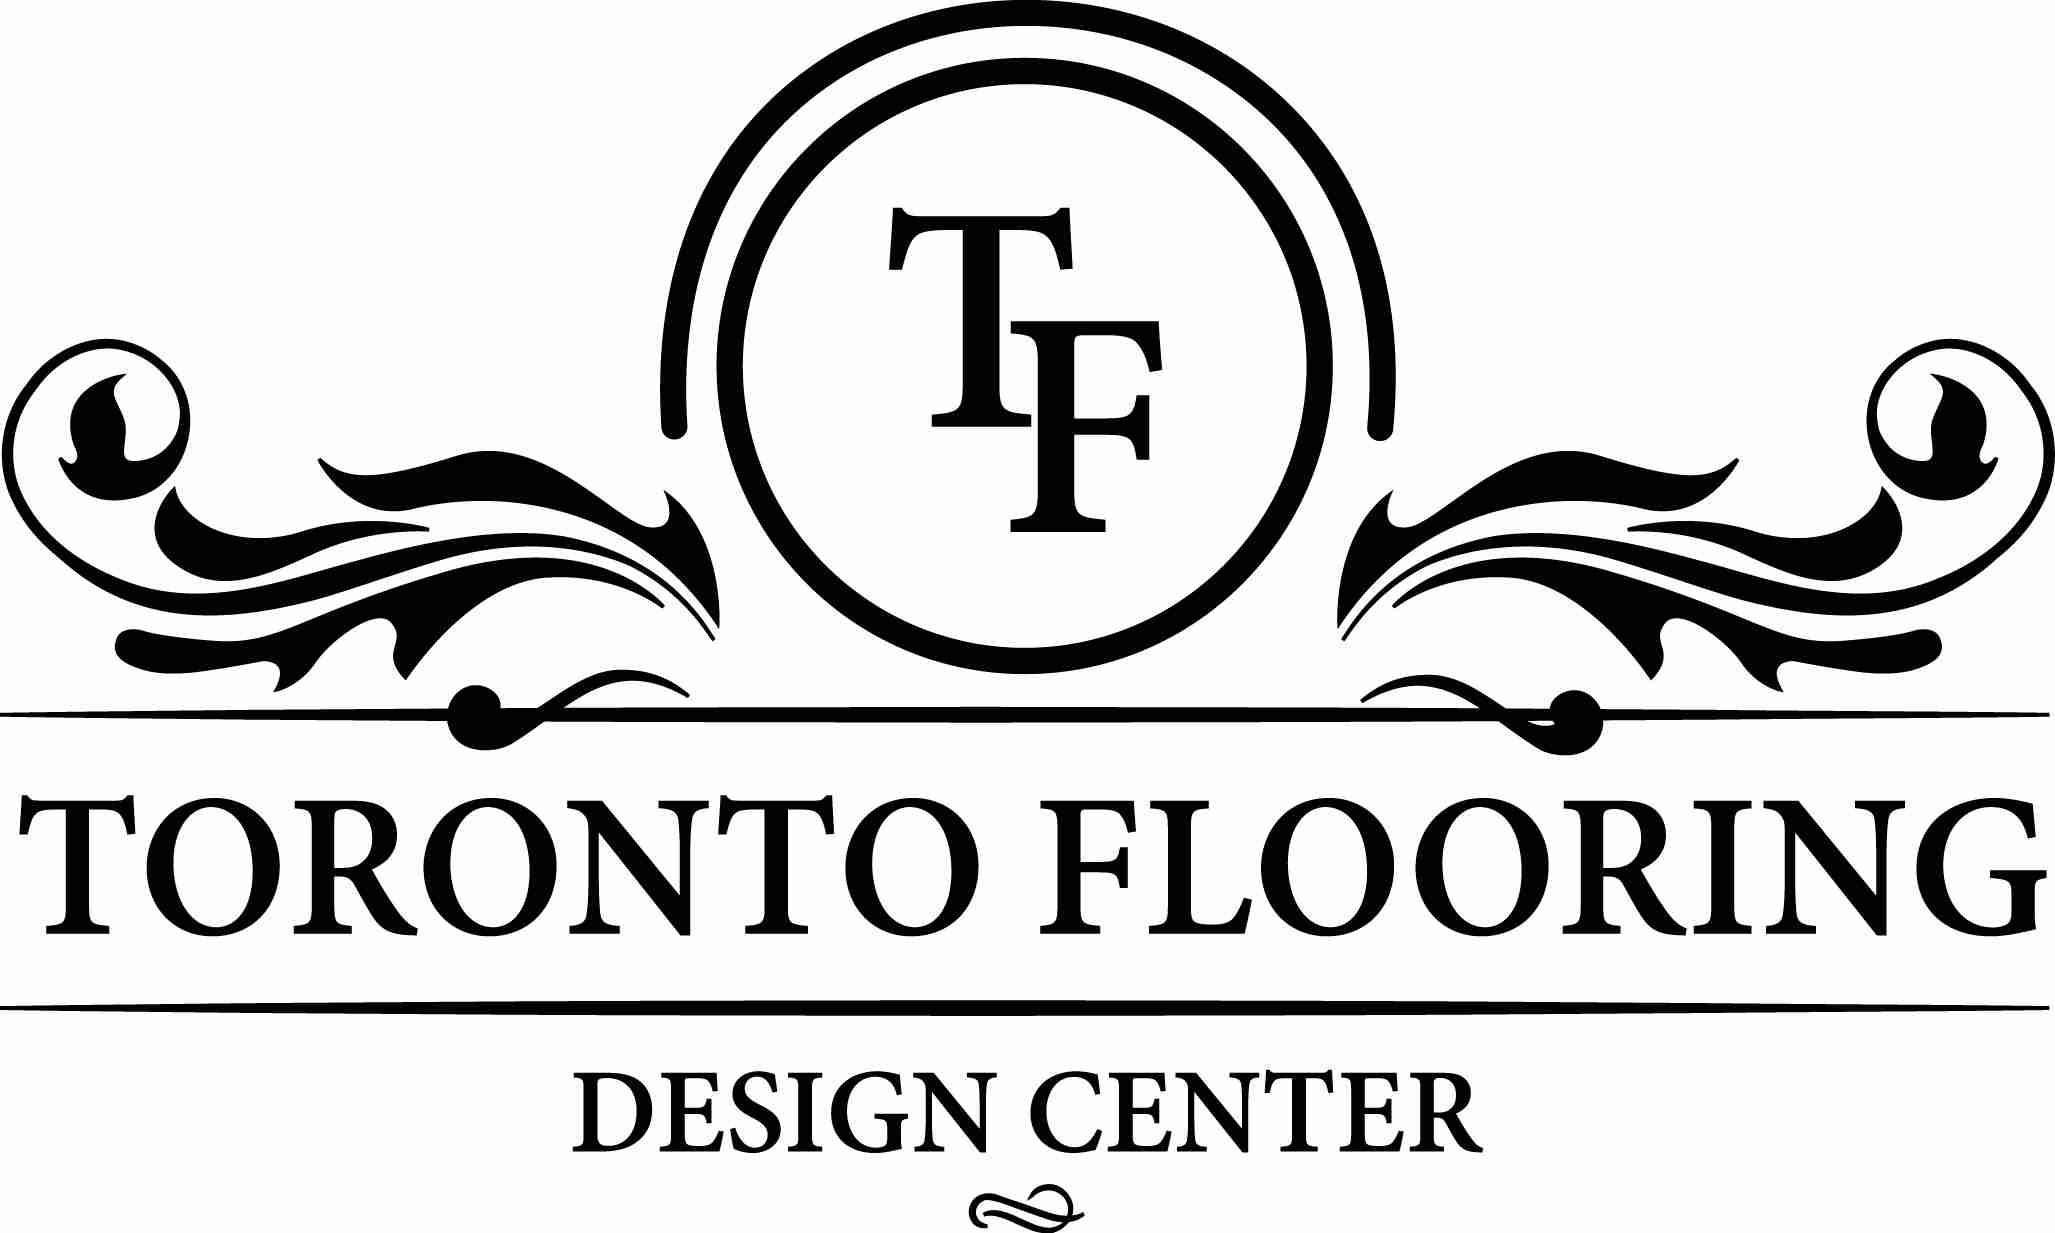 Toronto Flooring